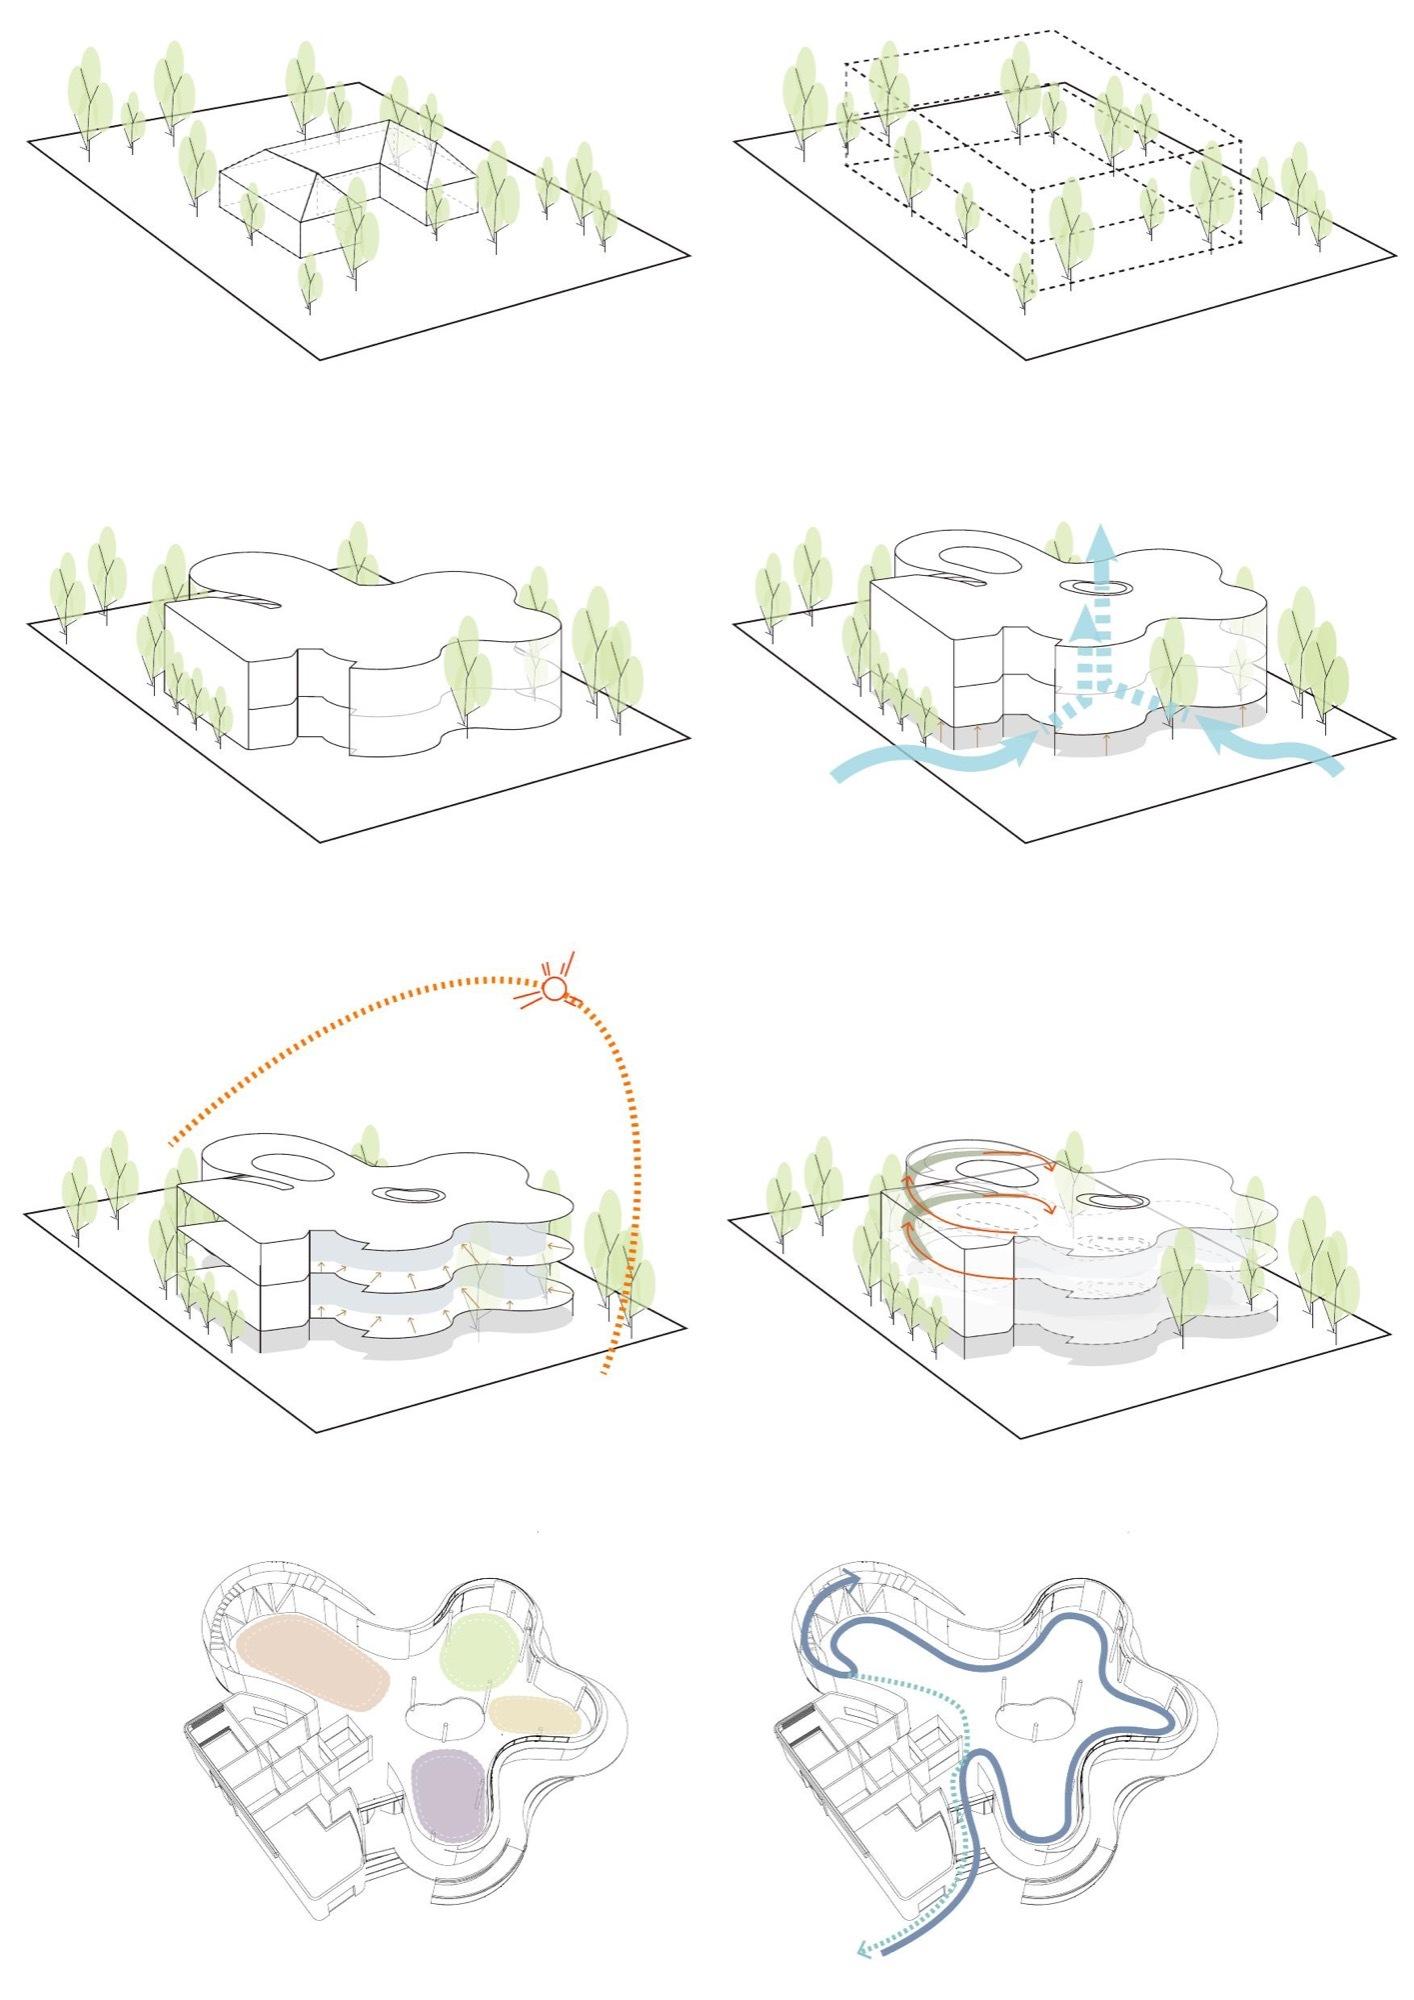 raid 5 concept with diagram ecm wiring galeria de eco pavilhão sinica emerge architects 34